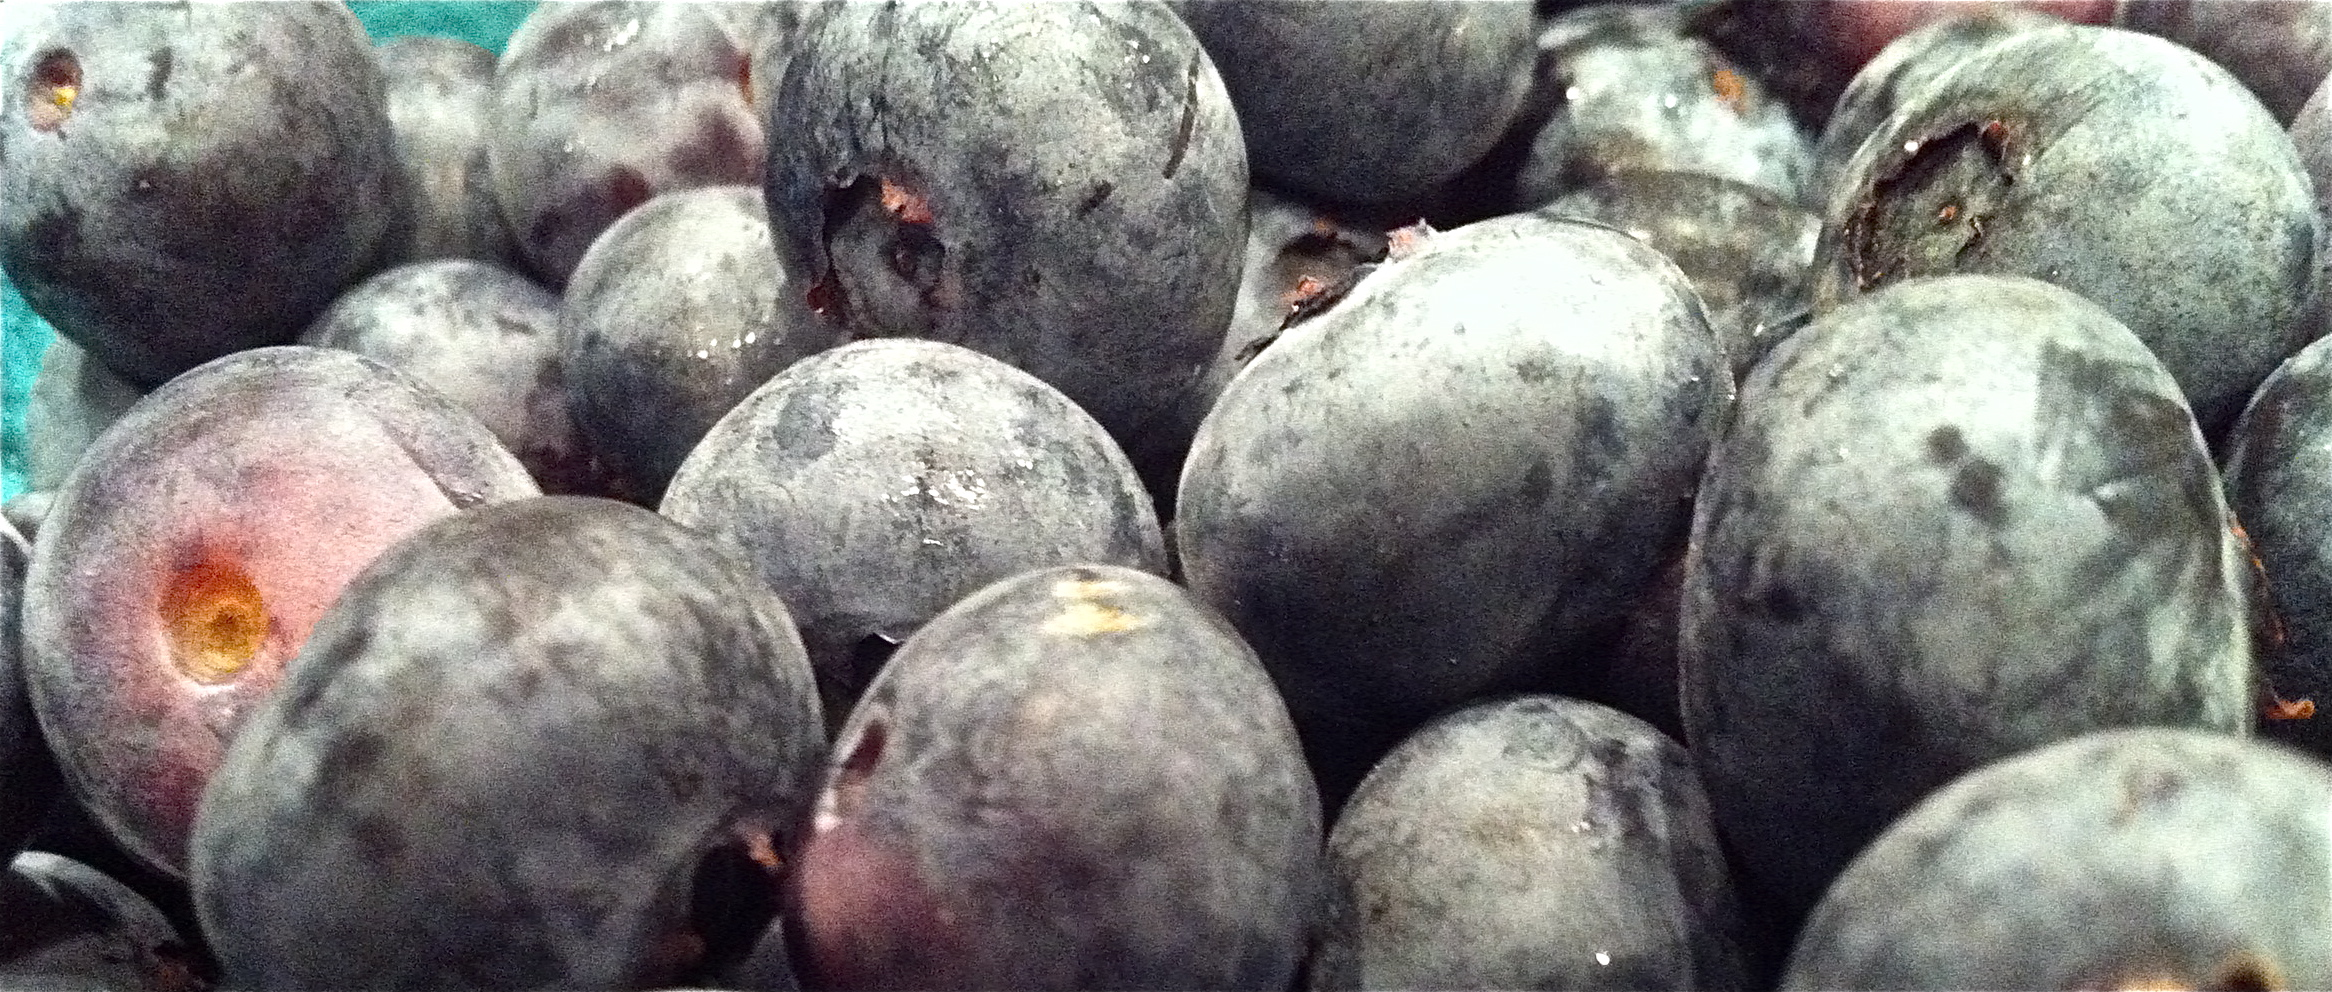 Blueberries2013.JPG